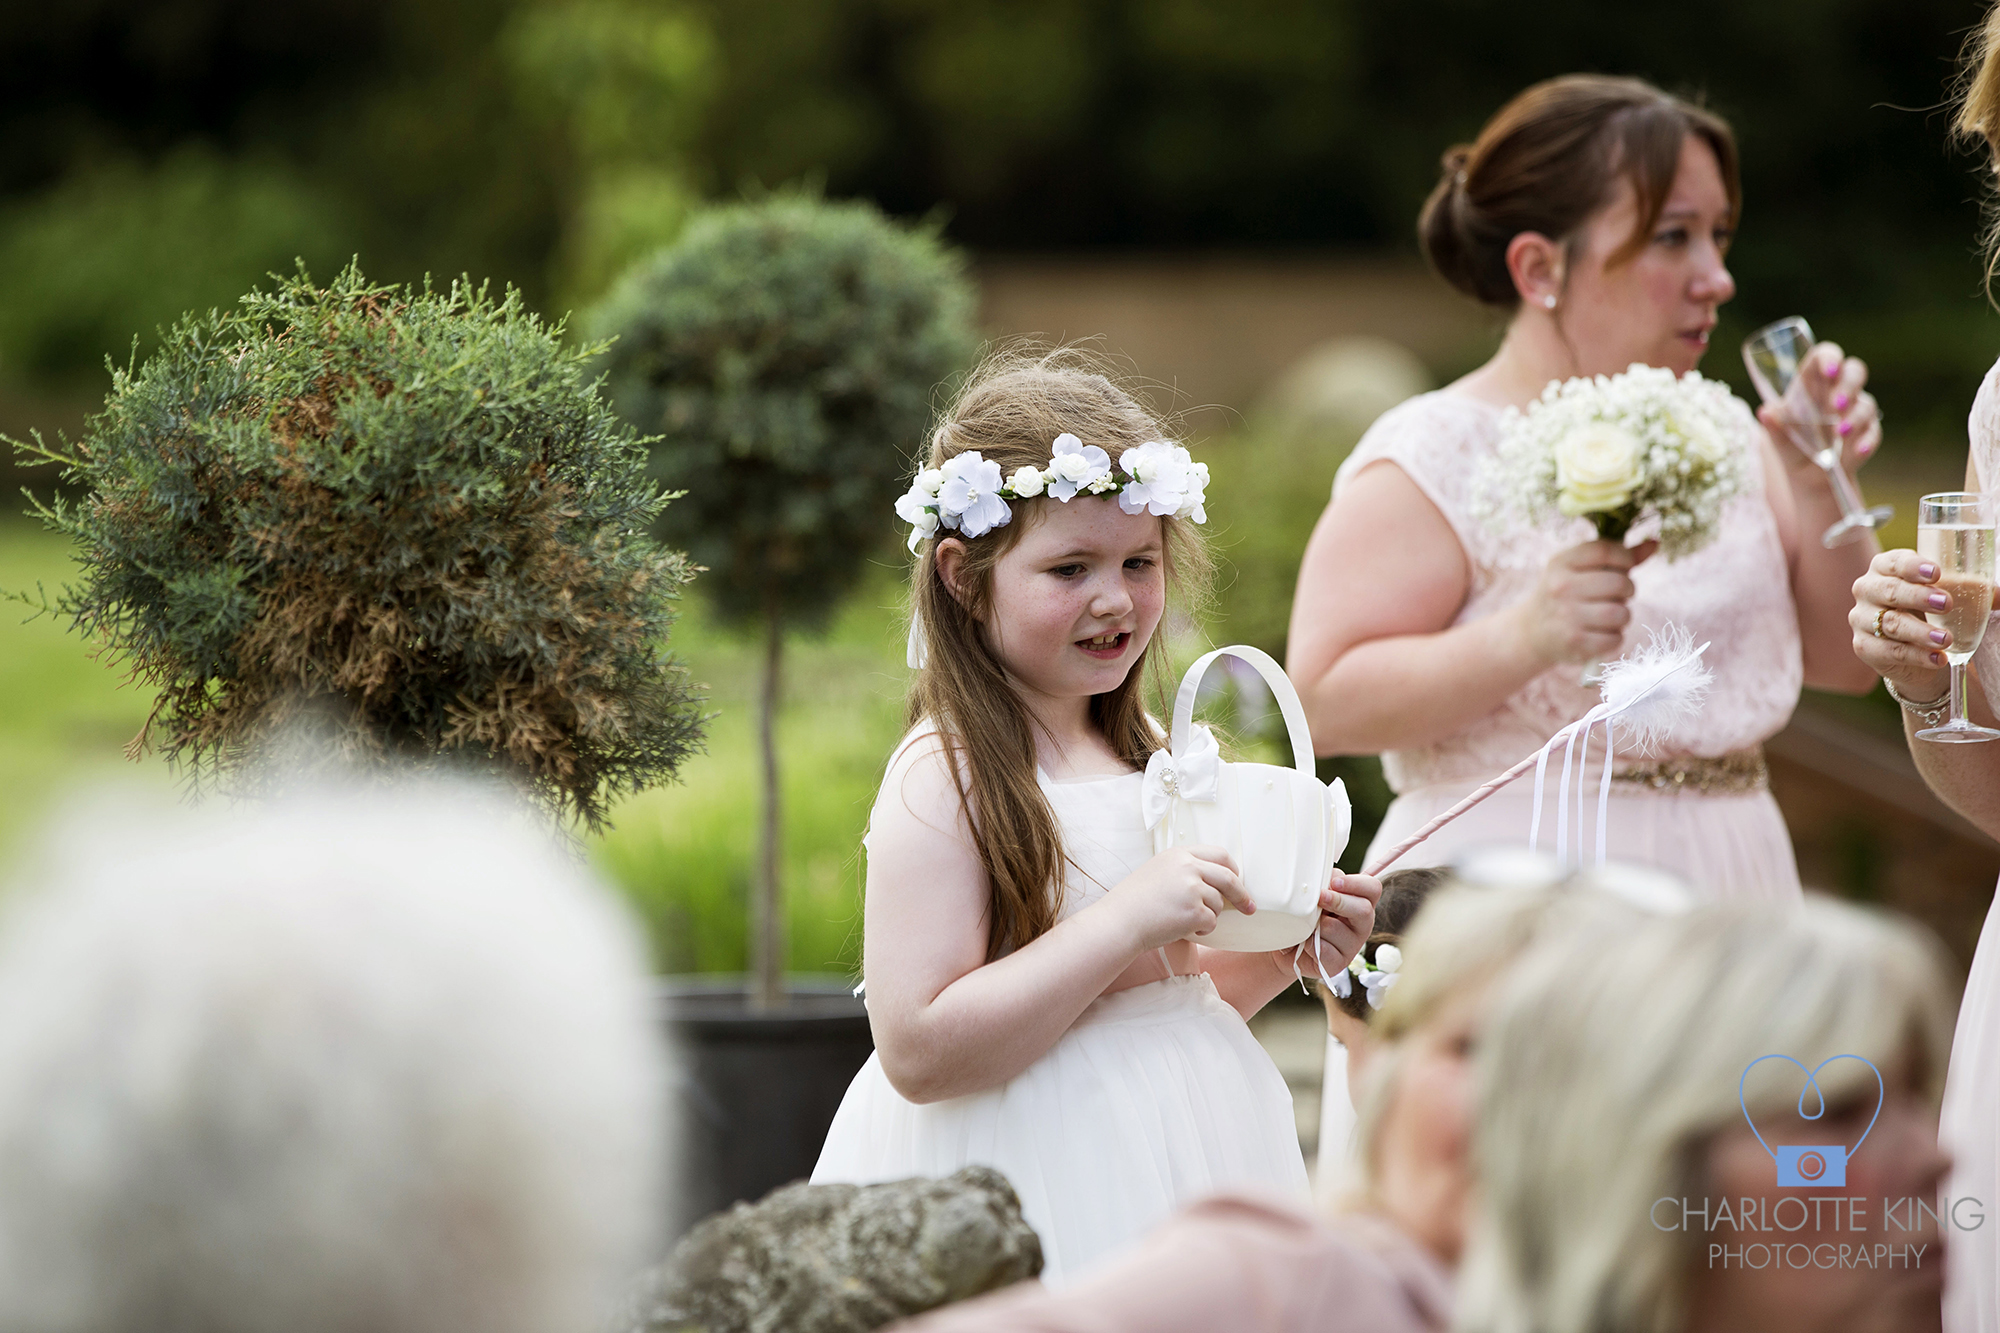 Woldingham-school-wedding-charlotte-king-photography (106)